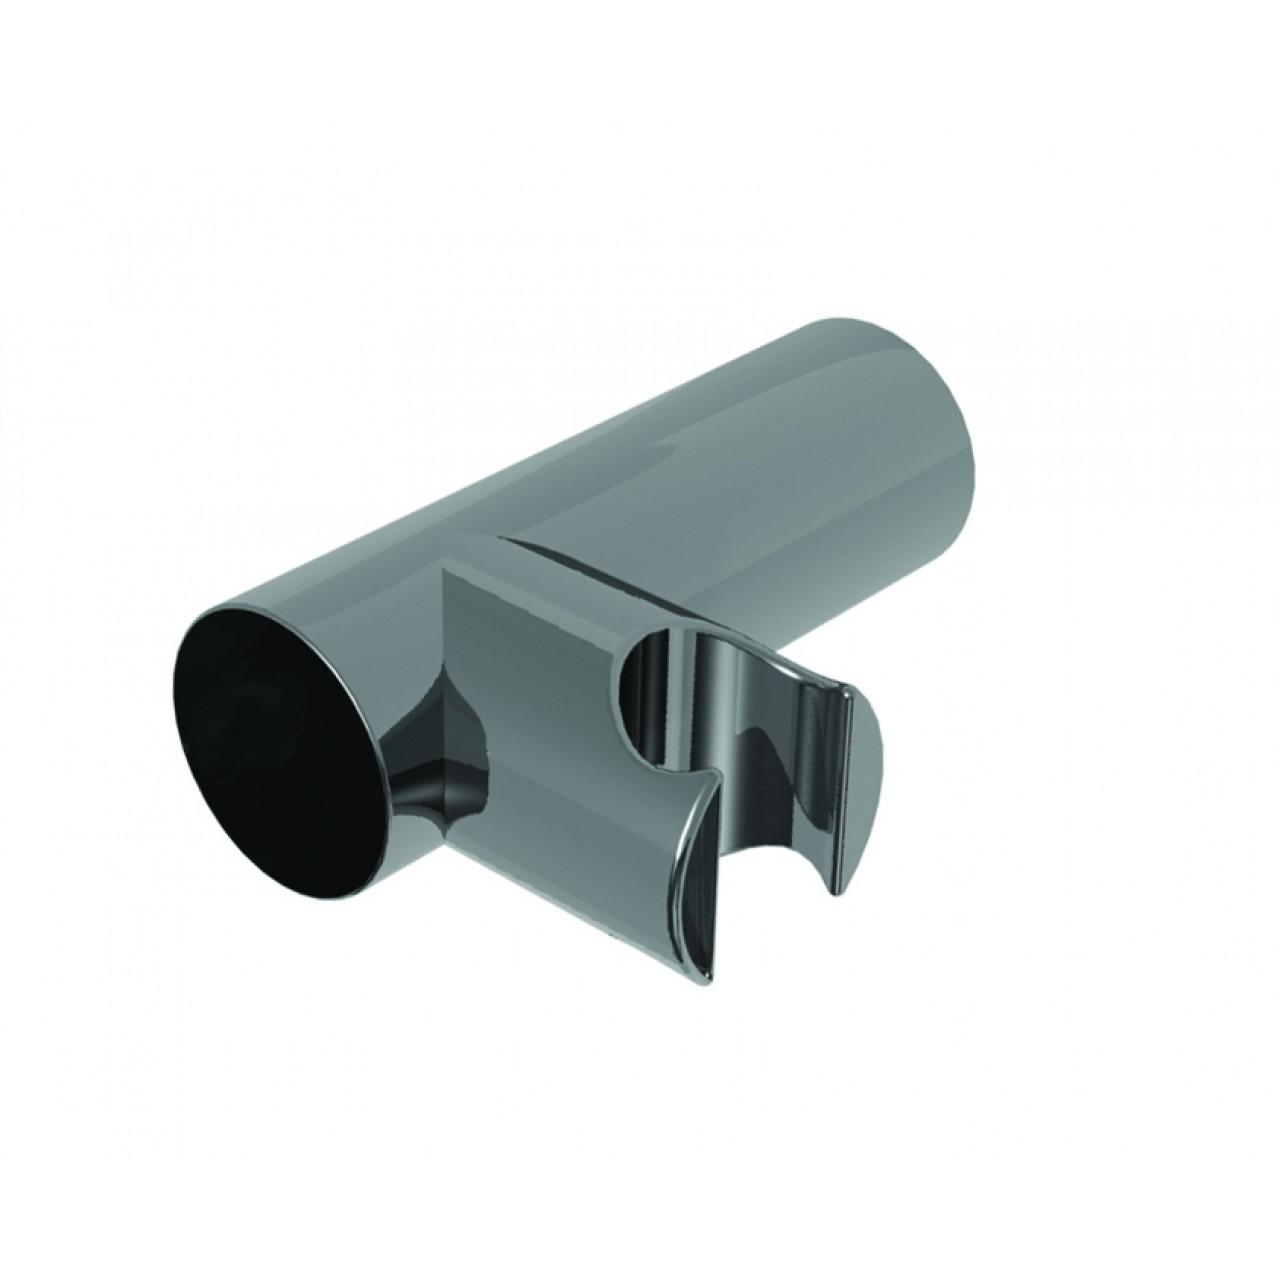 Diametro35 - Wall Mounter Support For Hand Shower